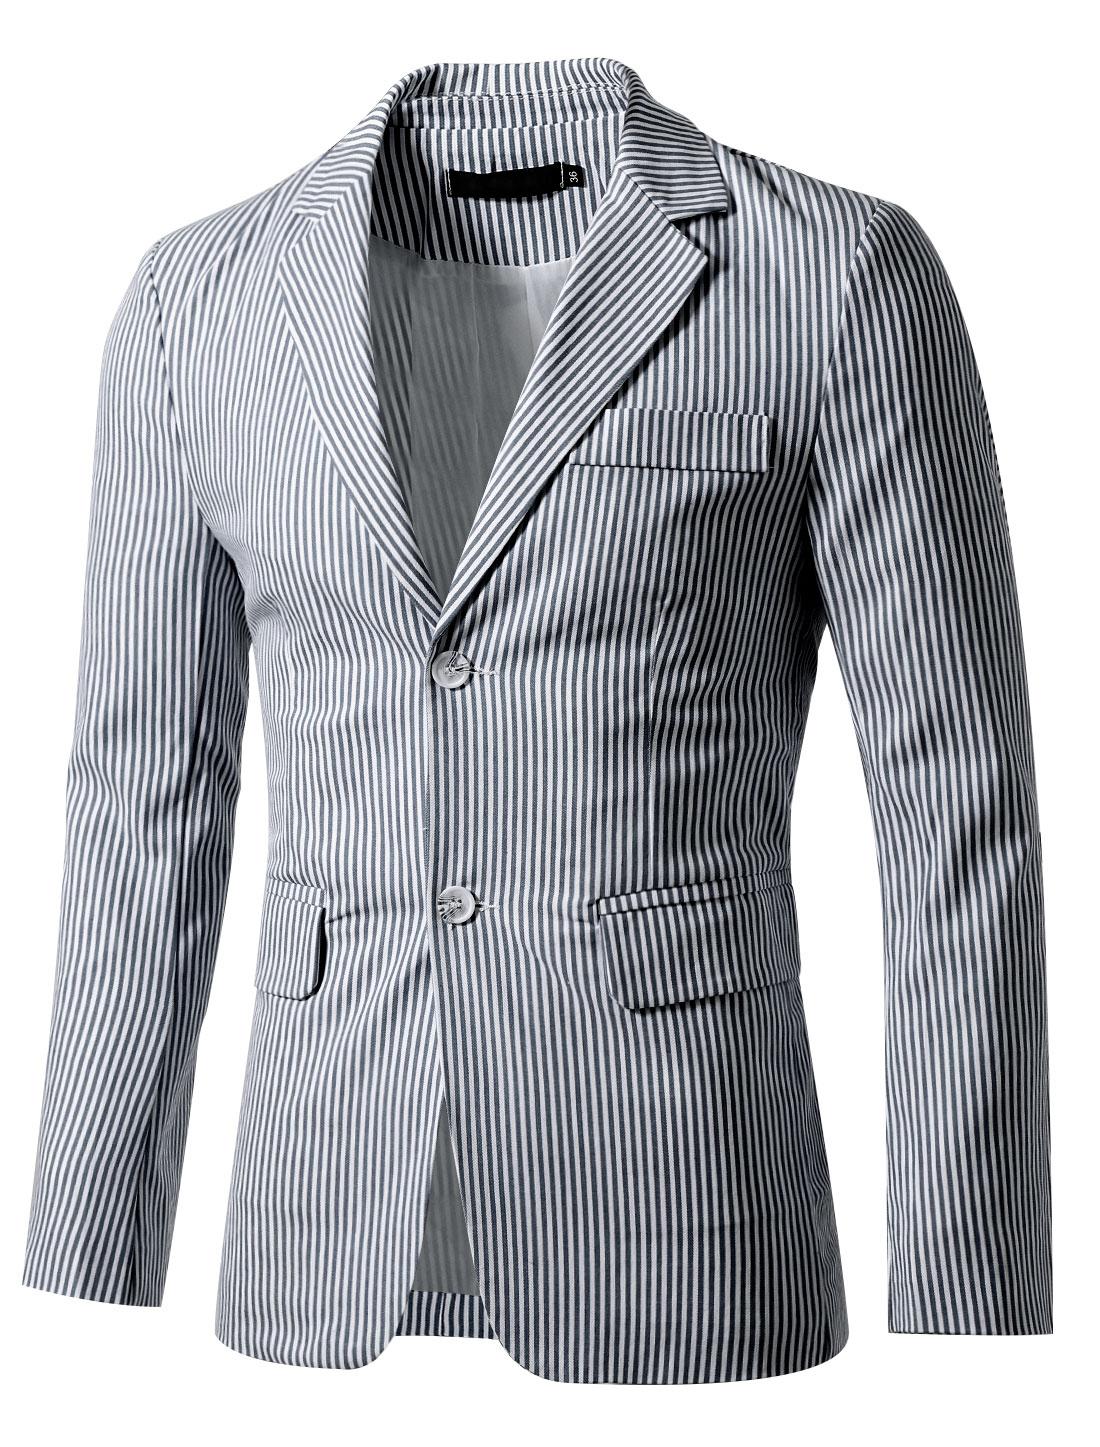 Men Notched Lapel Single Breasted Slim Fit Stripes Blazer Navy White 36